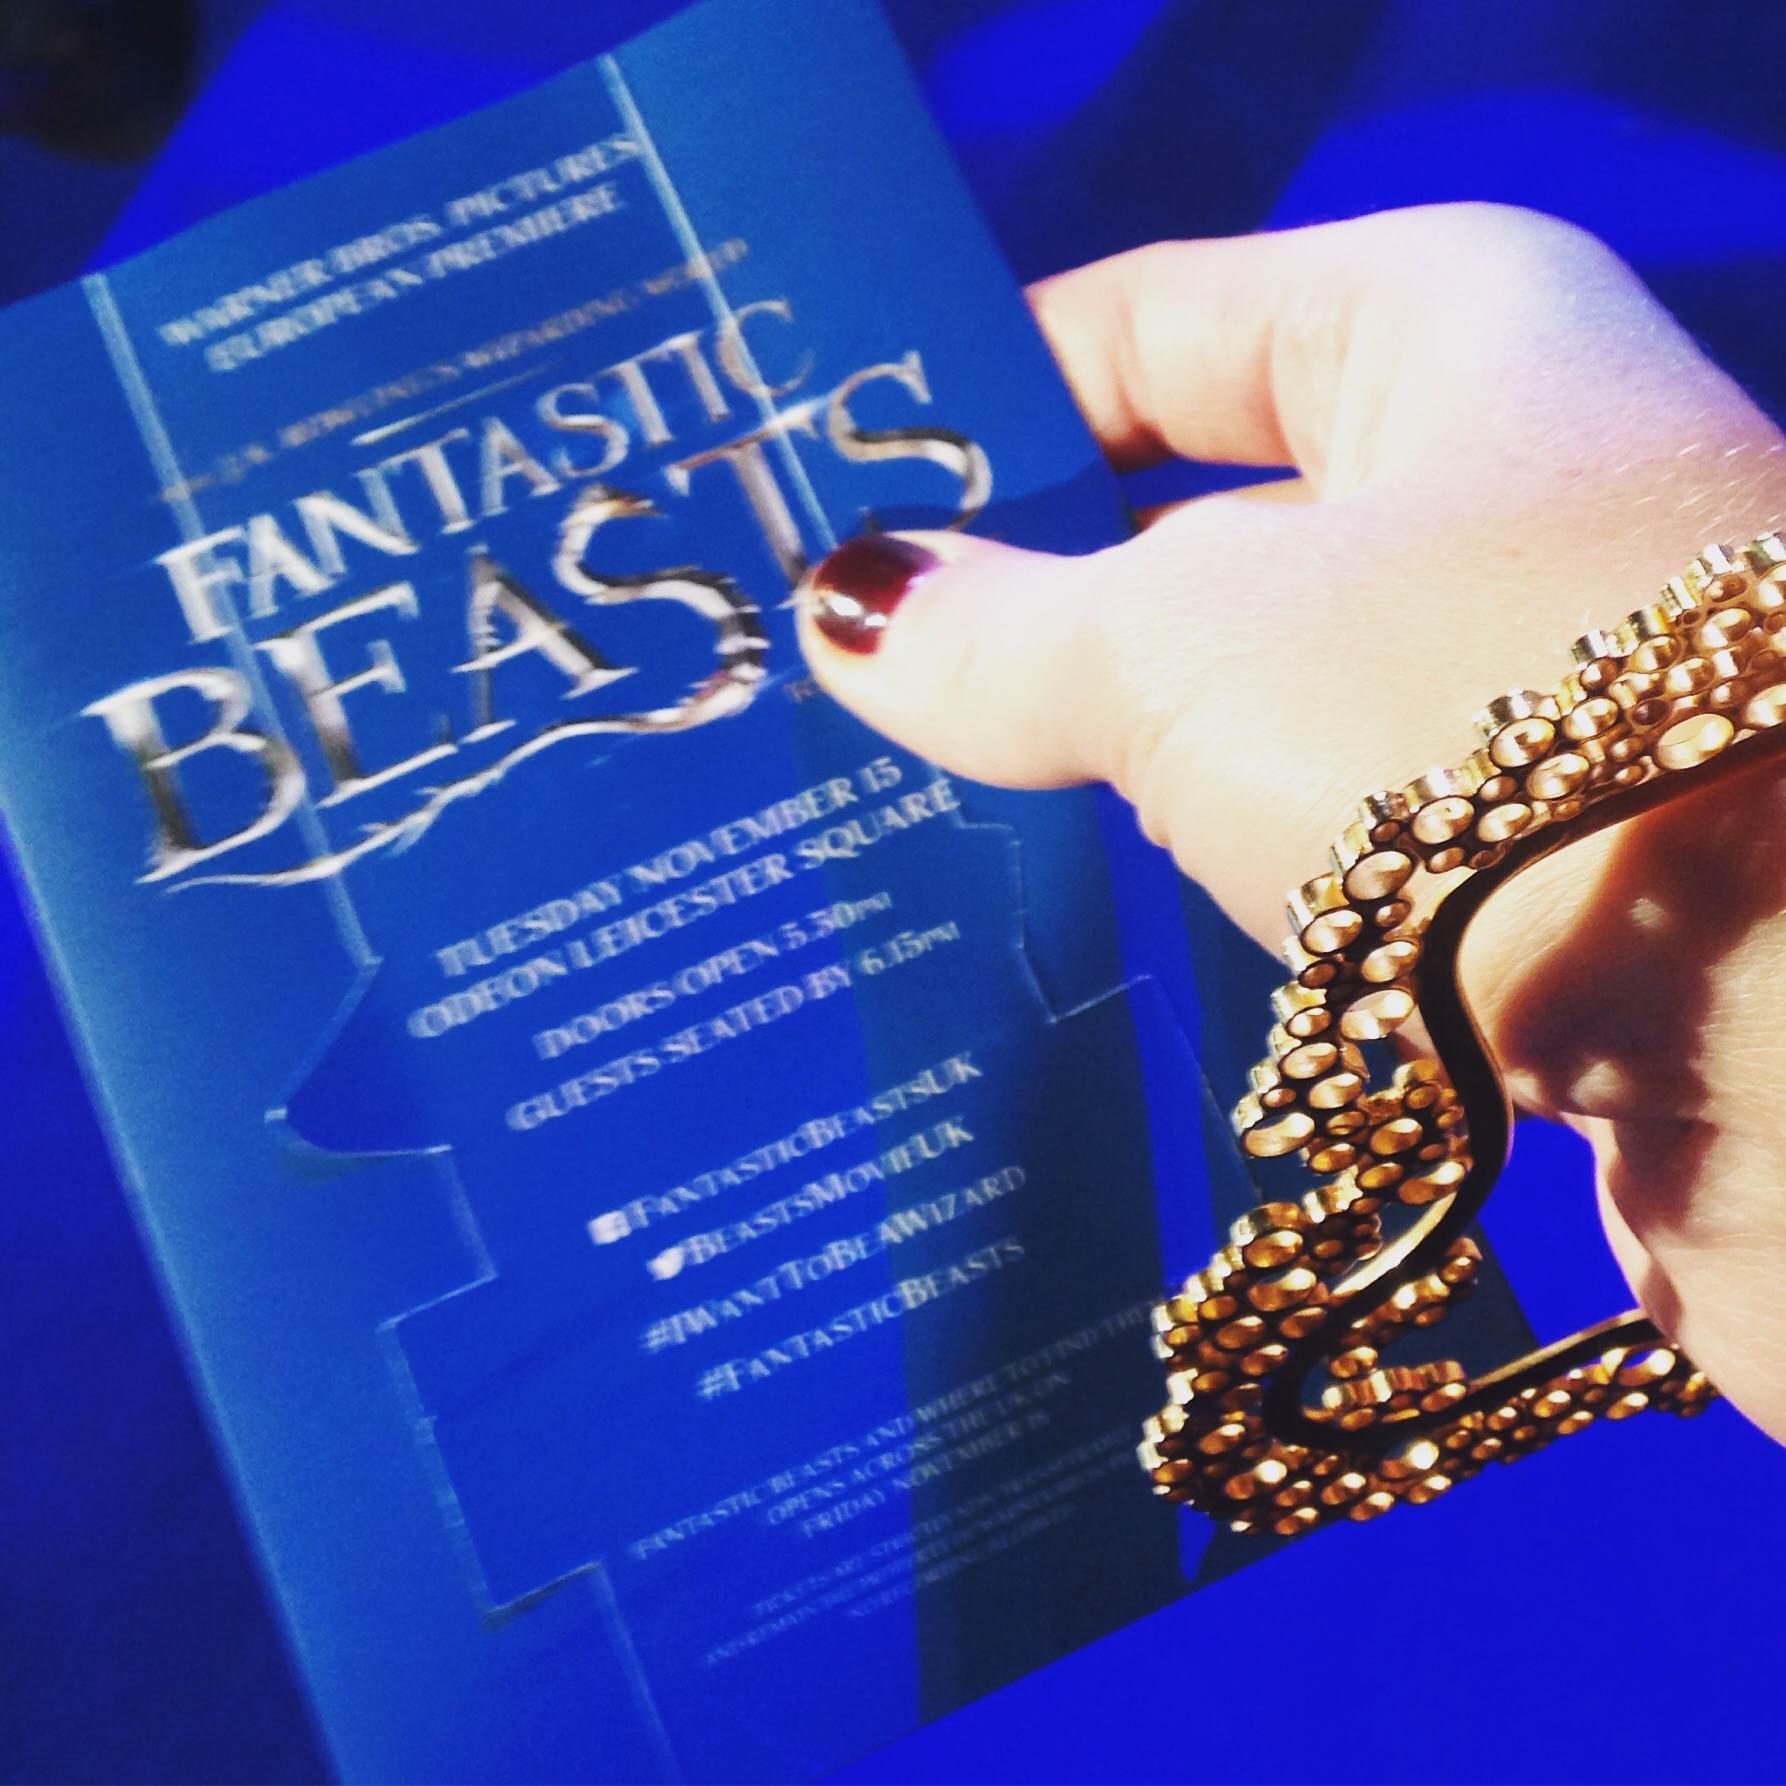 Viveka Alvestrand Jewellery goes to the Fantastic Beasts European premiere wearing a gold Fizz bracelet